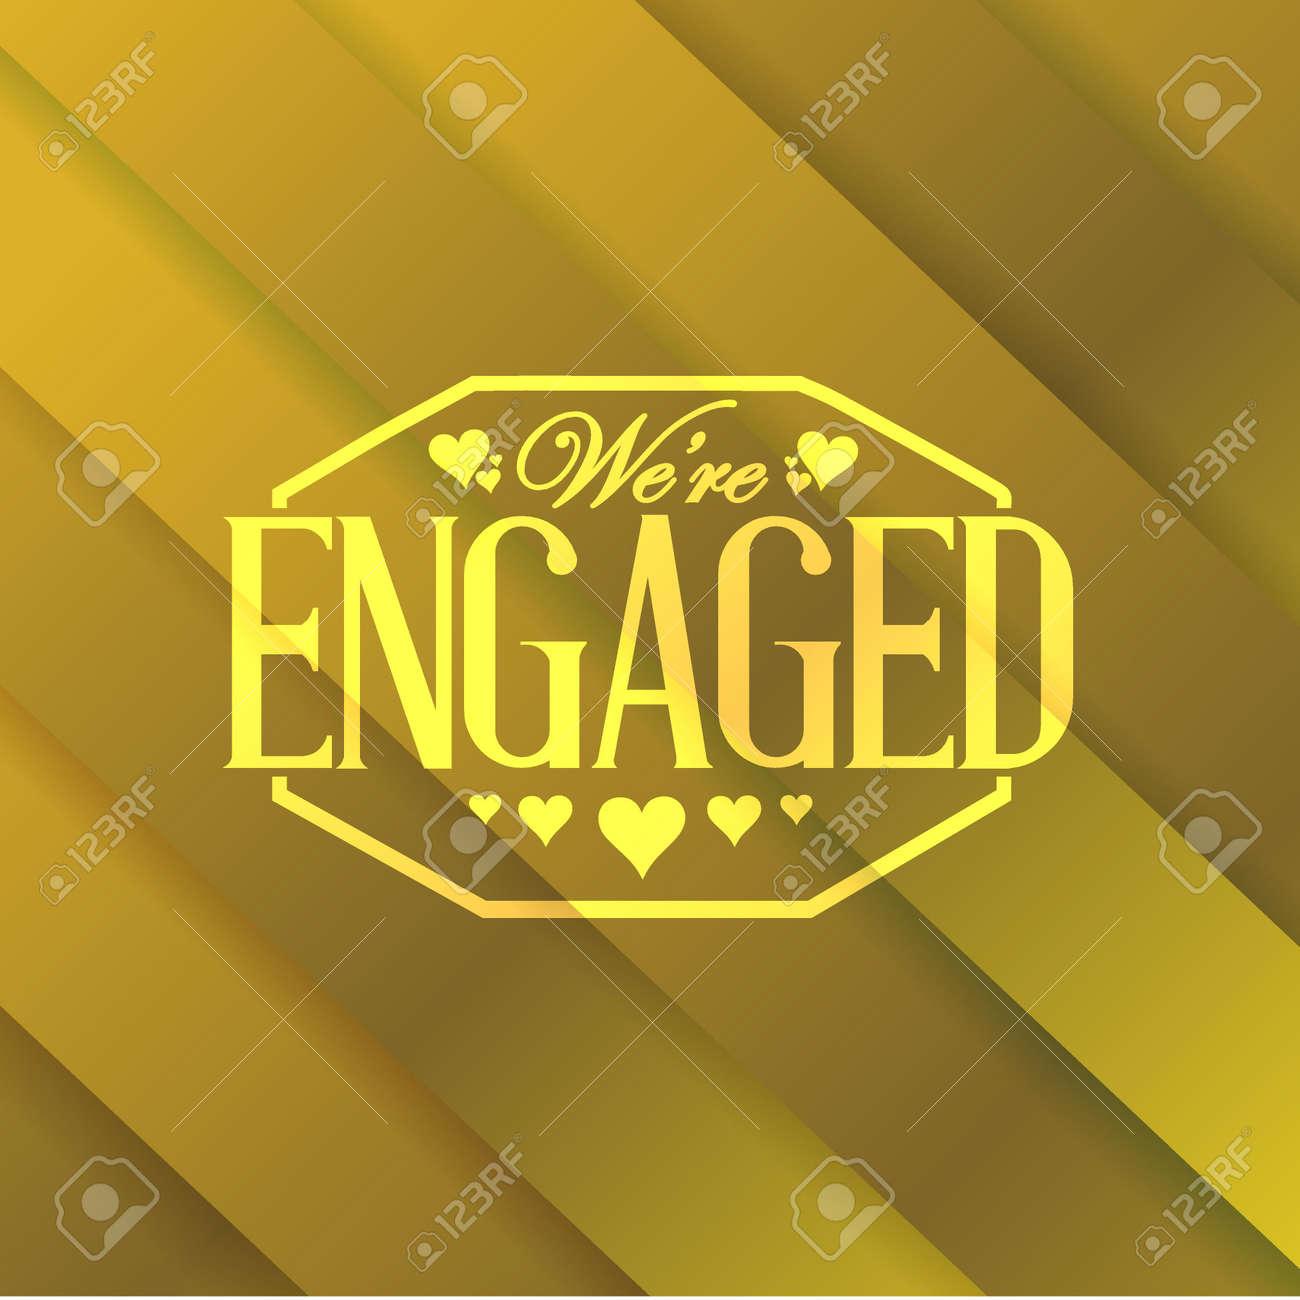 we are engaged stamp gold card background illustration design